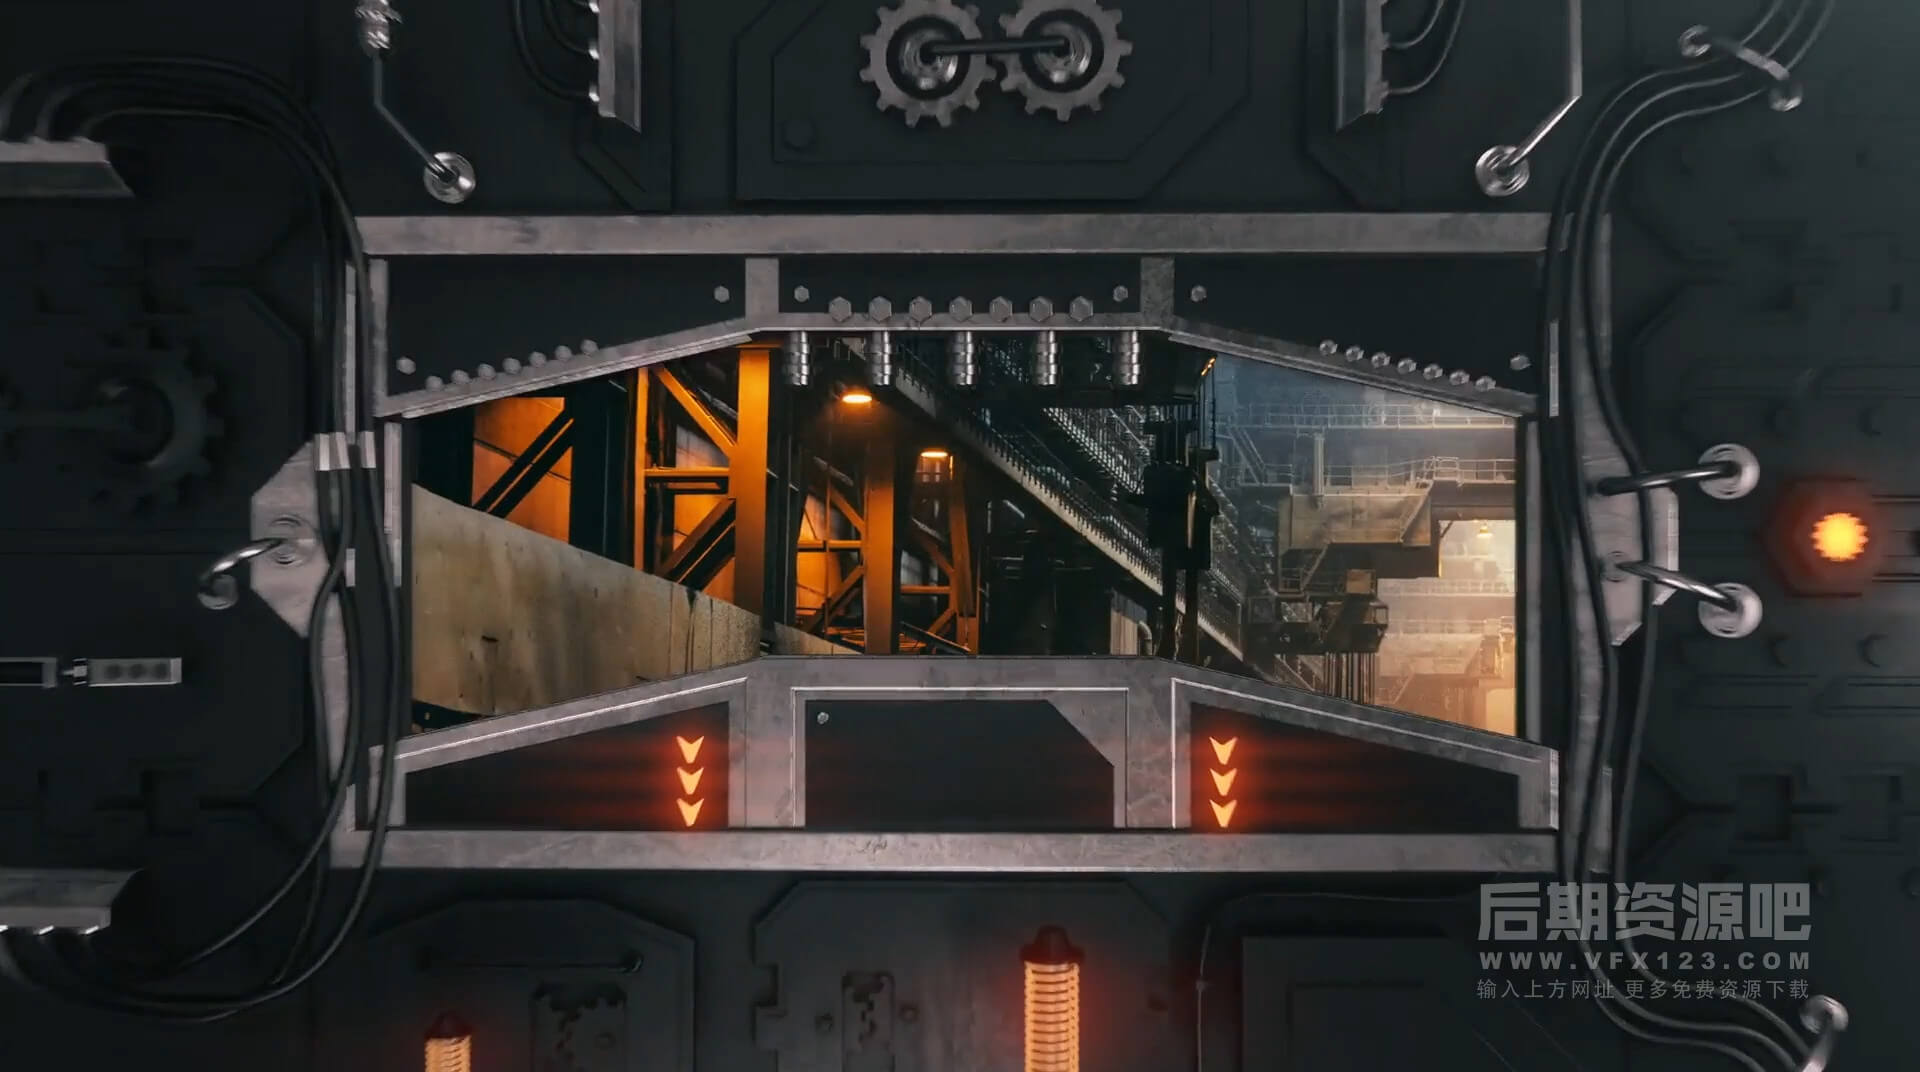 Fcpx插件 钢铁金属齿轮熔炉工业风格徽标LOGO展示模板 带转场